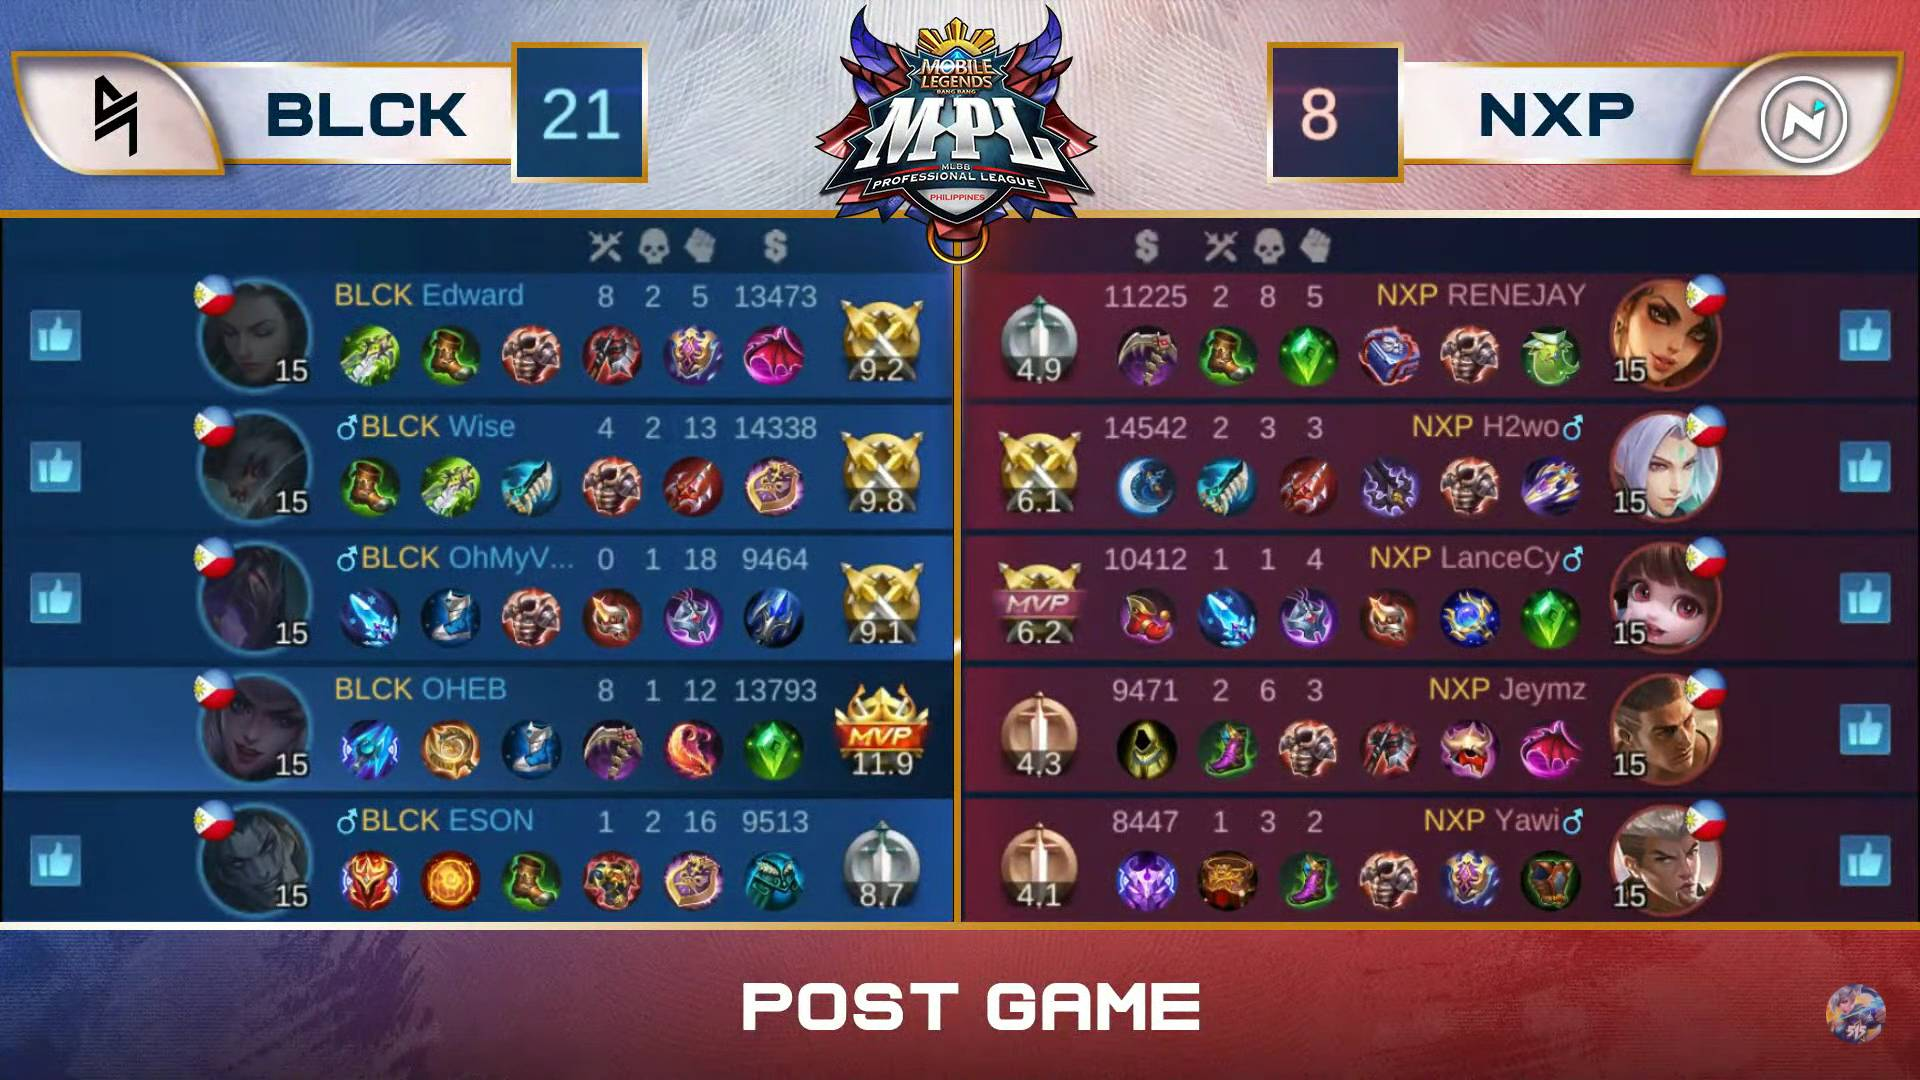 MPL-PH-7-Blacklist-def-NXP-Game-2 OHEB shines bright as Blacklist makes short work of Nexplay in MPL-PH ESports Mobile Legends MPL-PH News  - philippine sports news